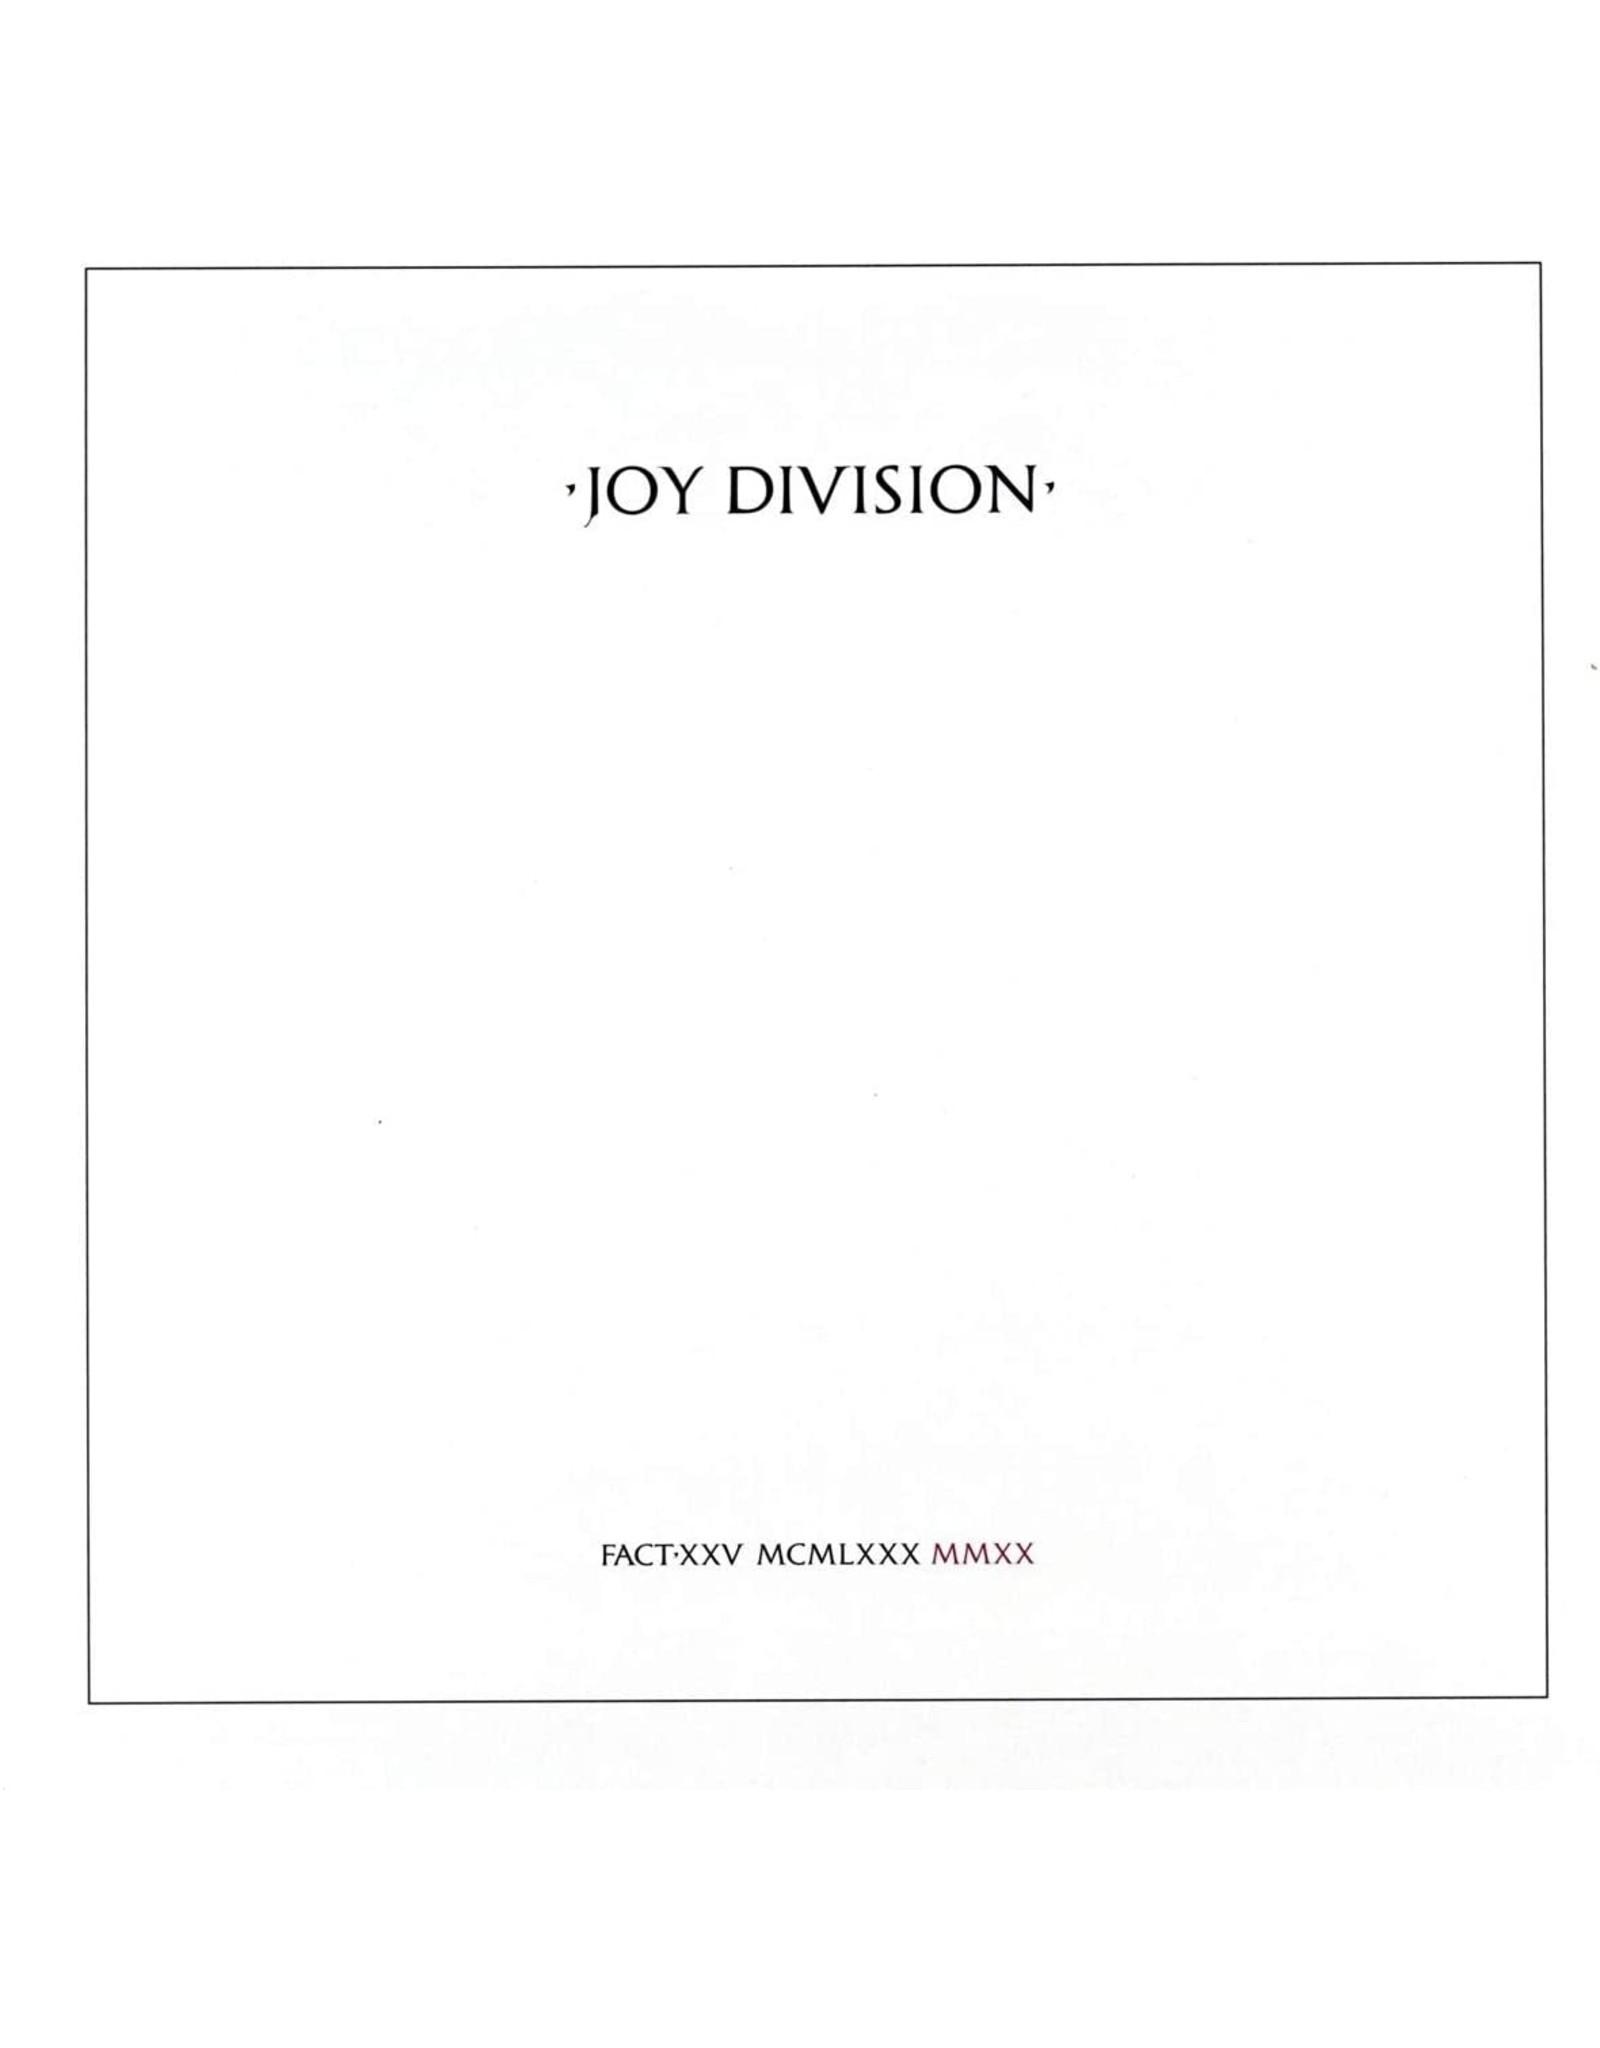 Joy Division - Closer (40th Anniversary Crystal Clear Vinyl)